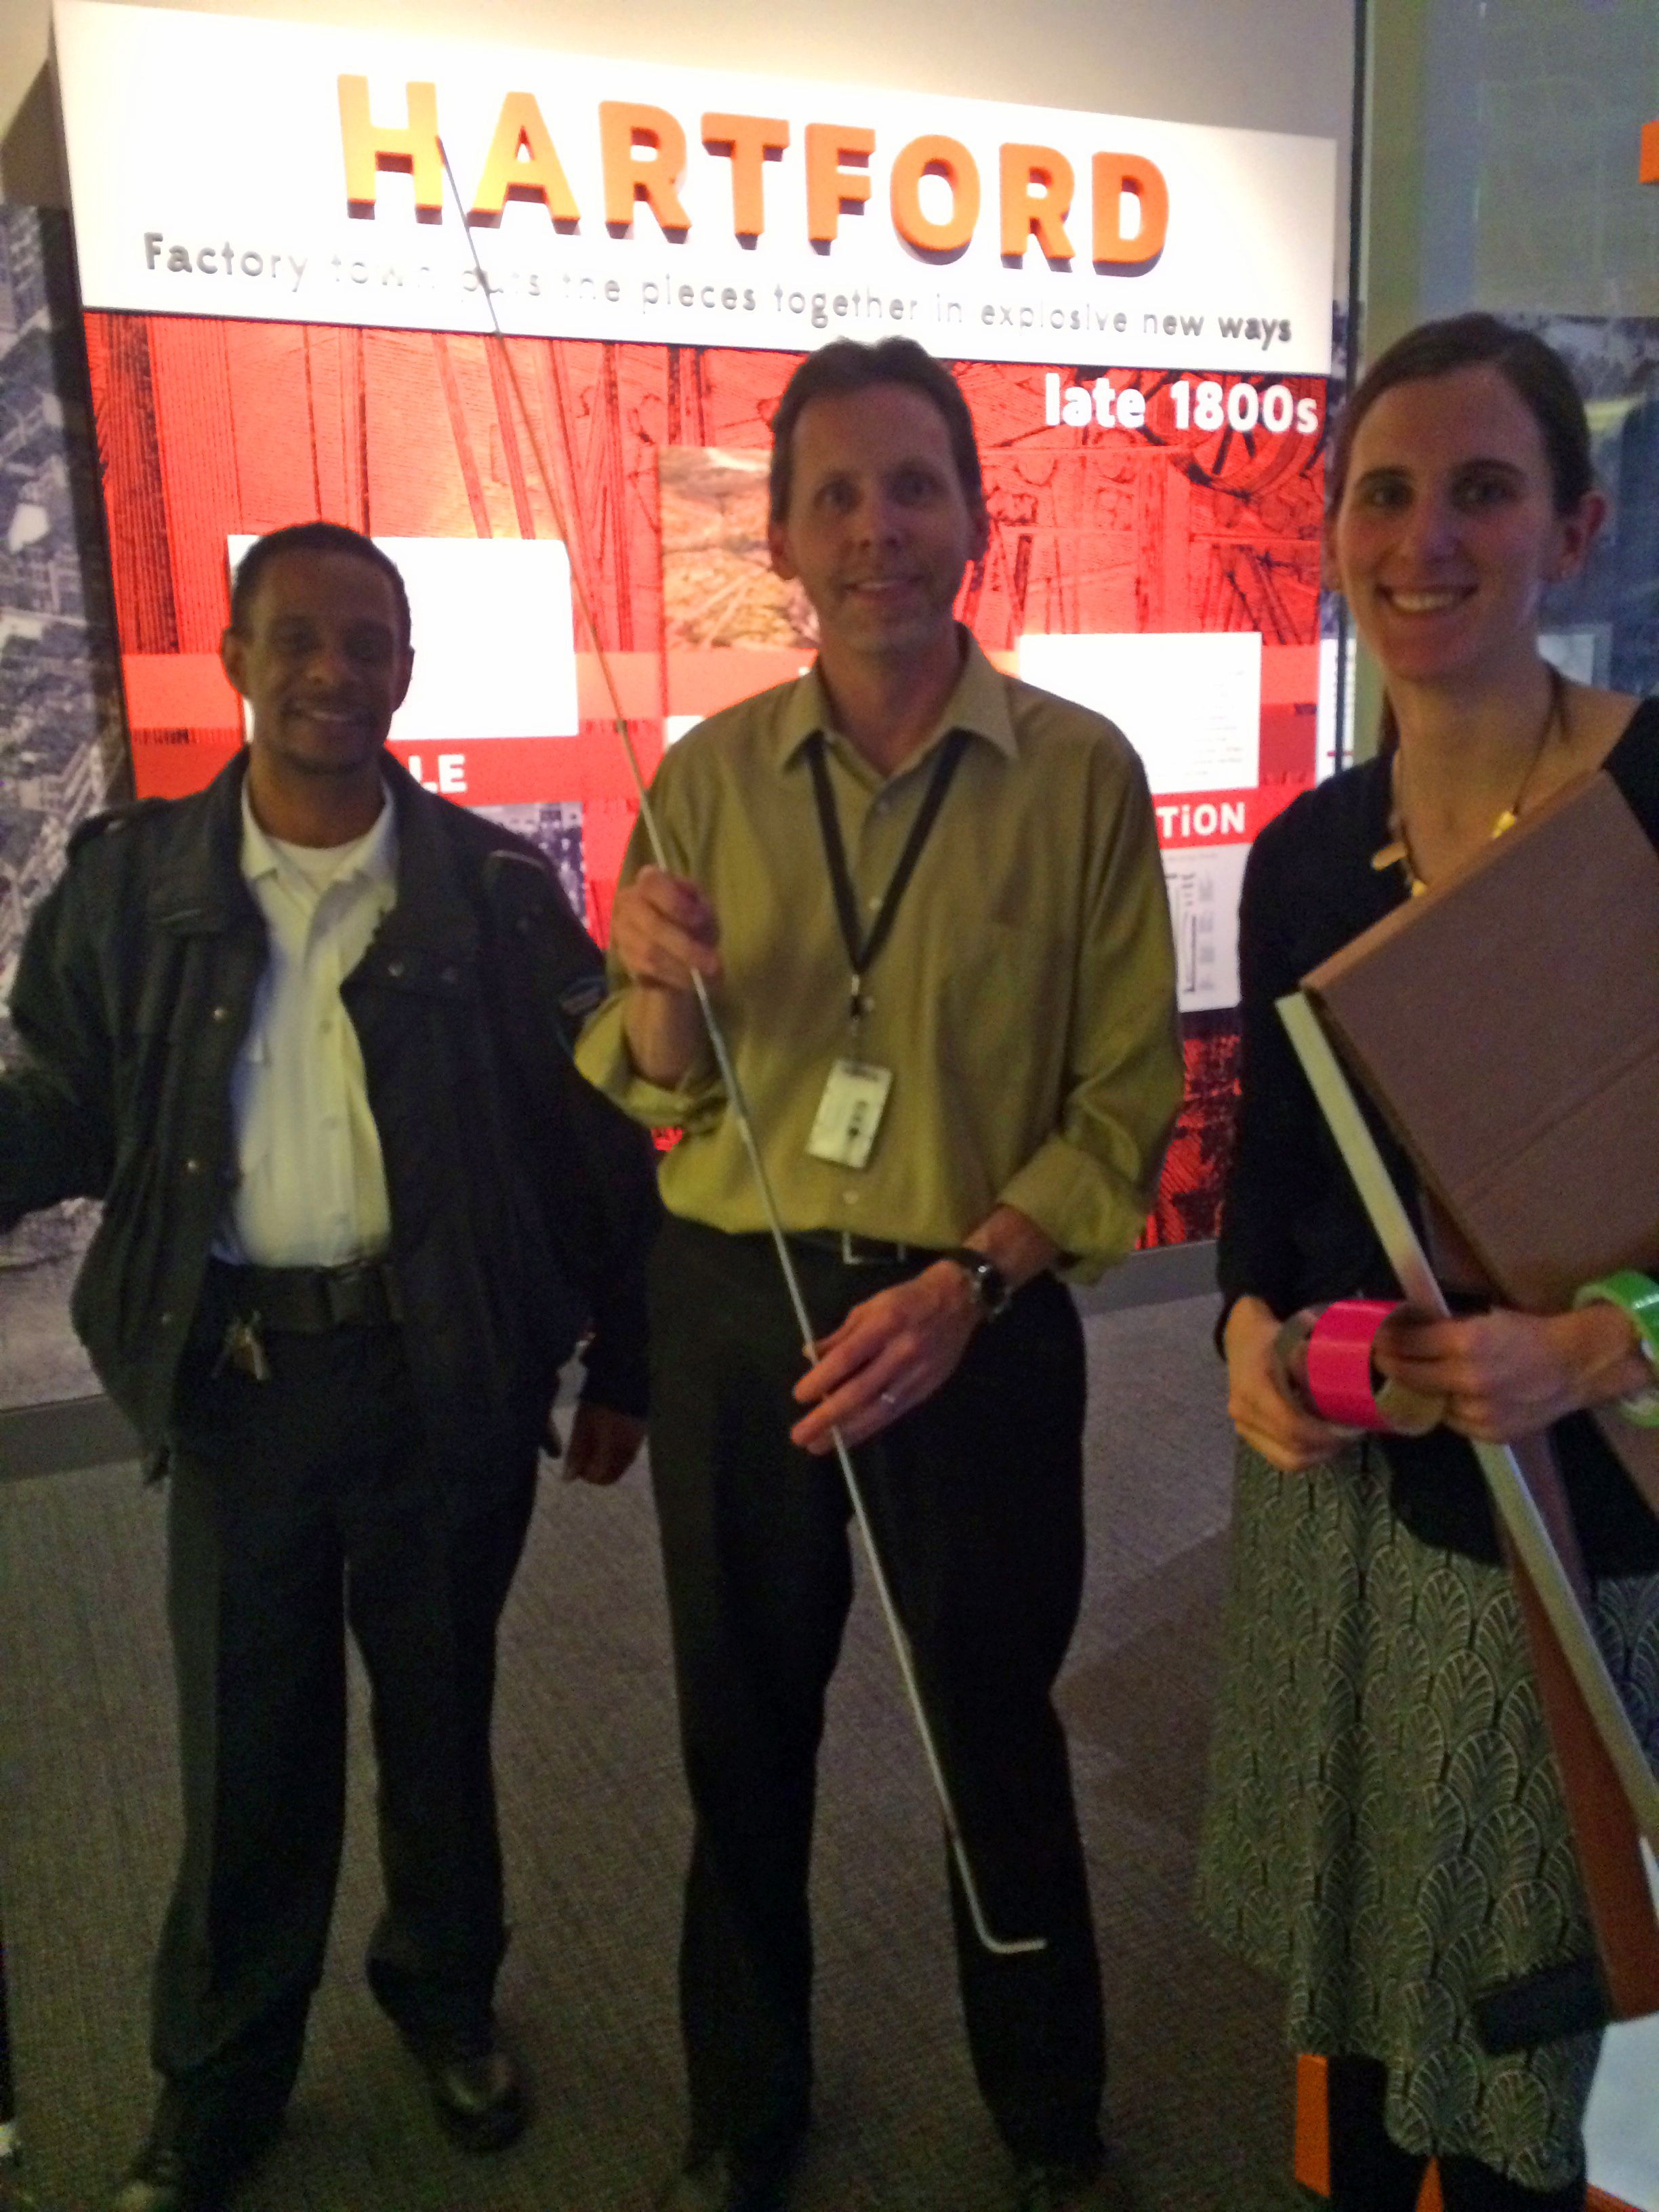 National Museum of American History staff members Sergeant Patrick Newman, Tim Pula, and Jocelyn Knauf